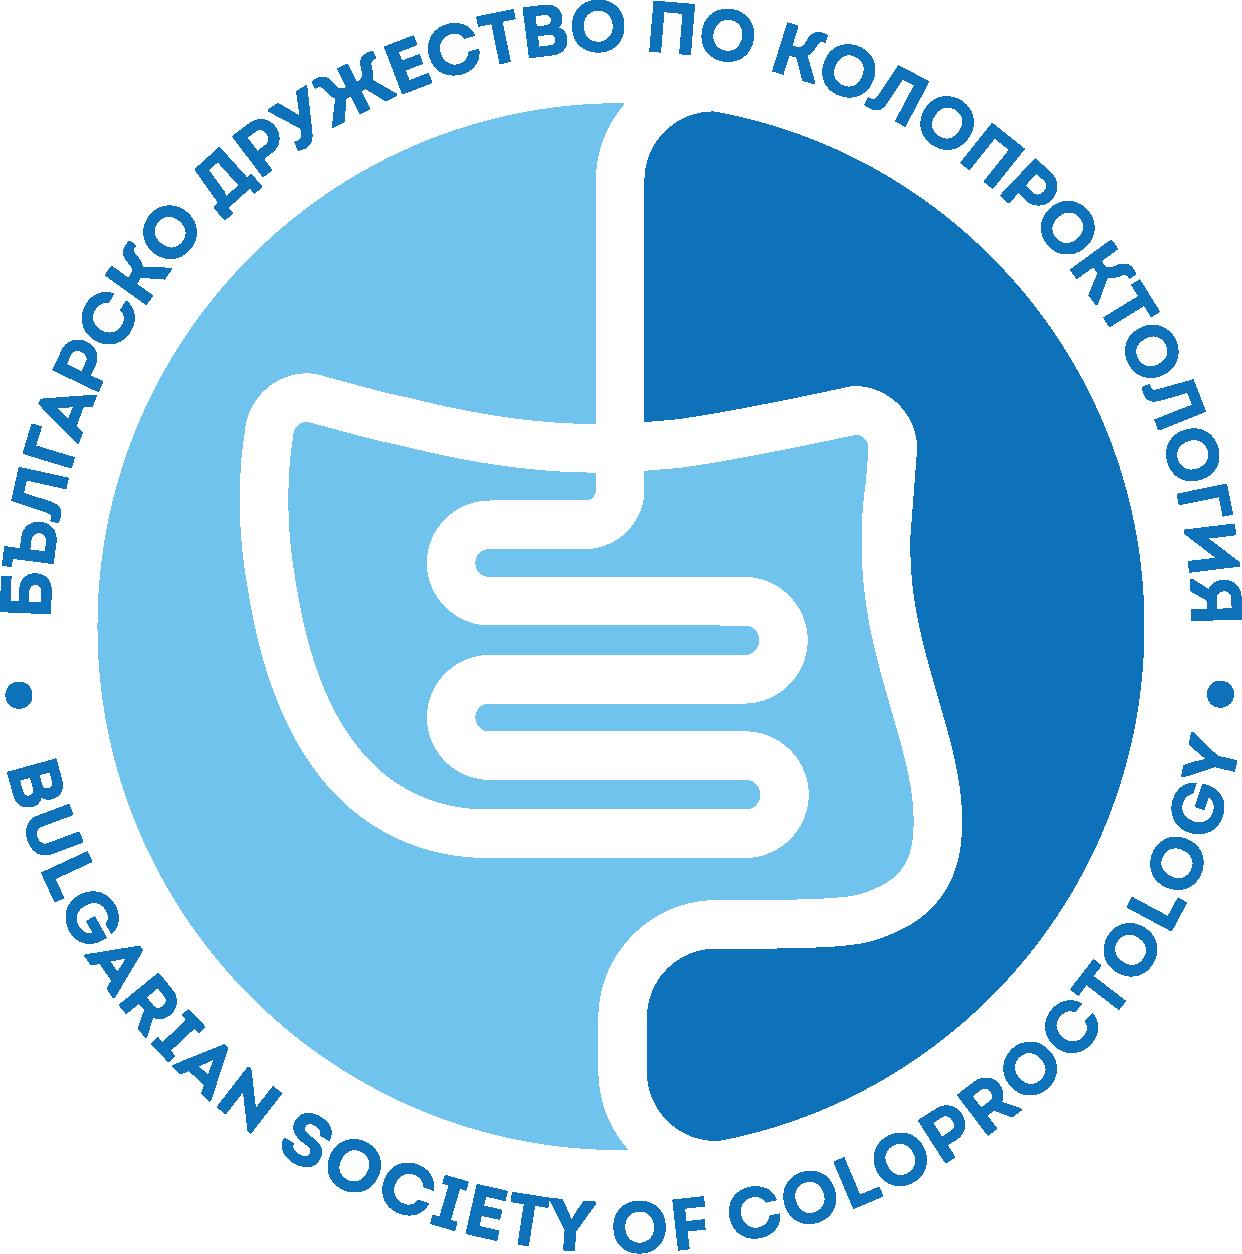 bscp_logo